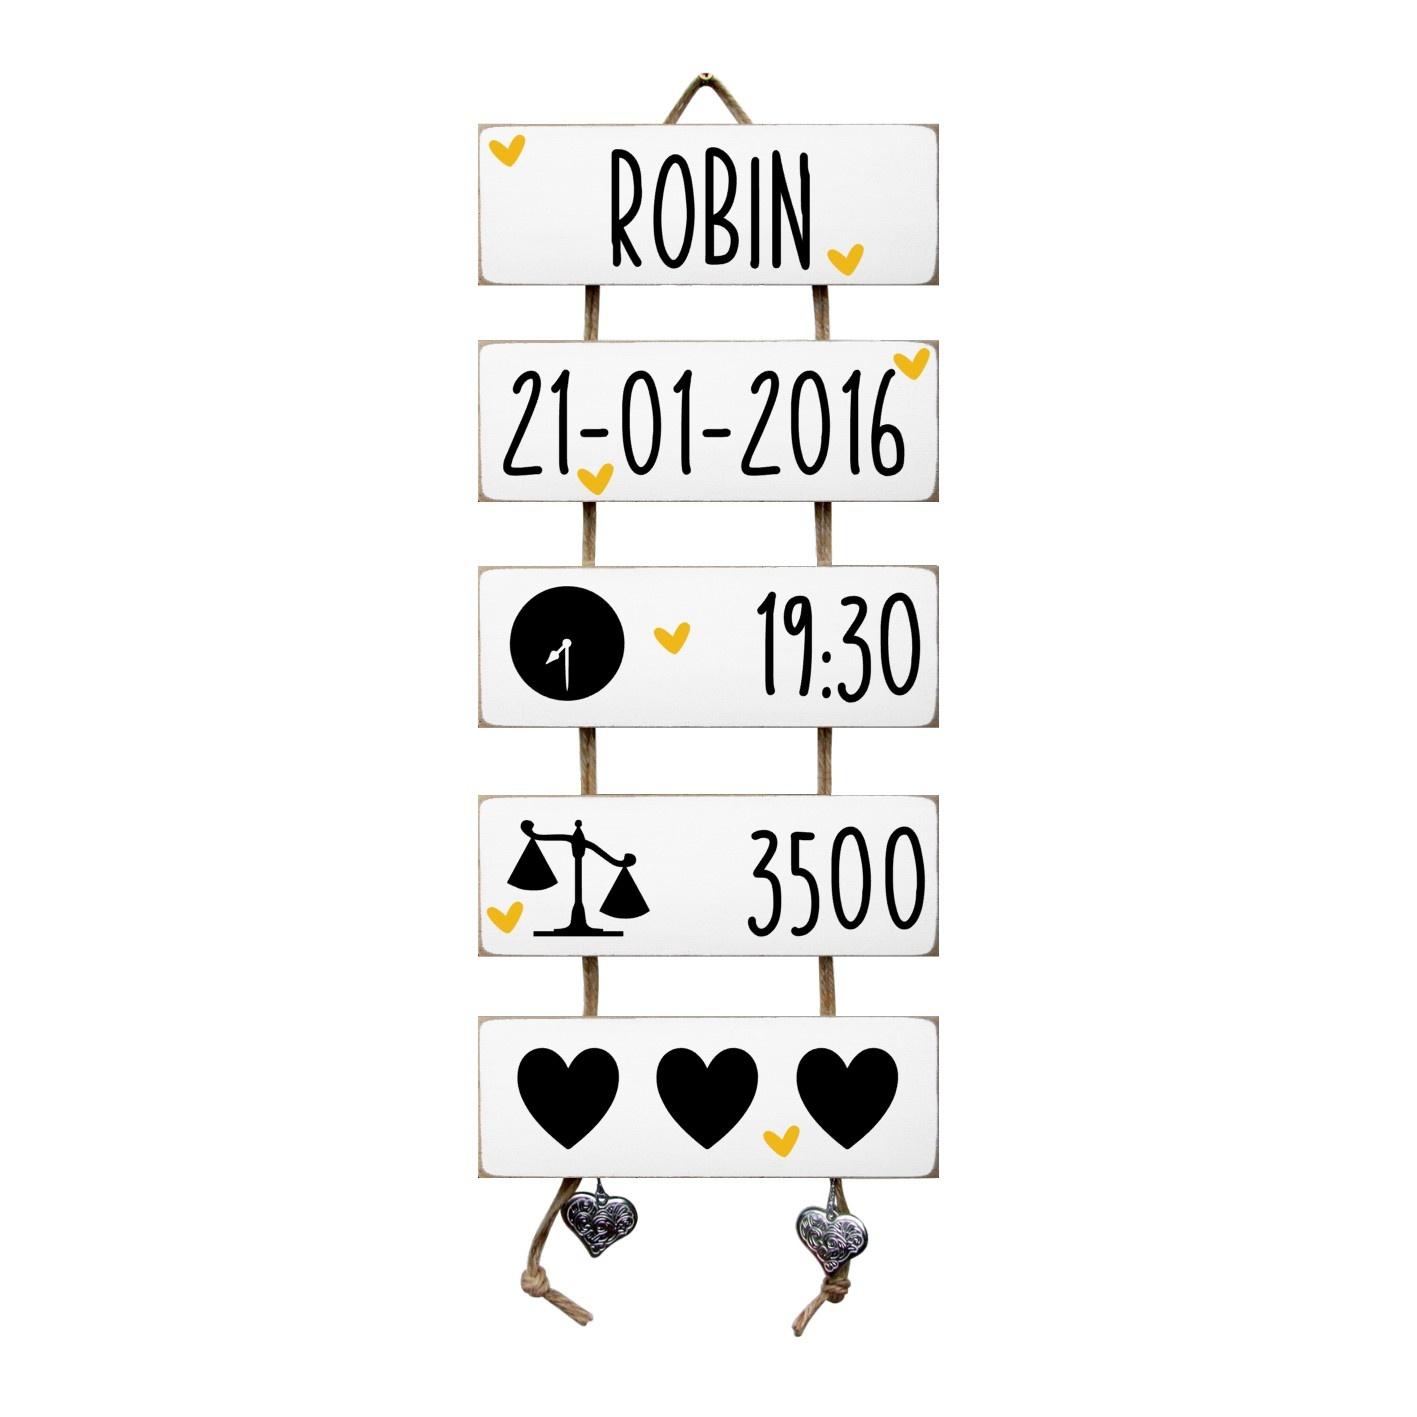 Kraamcadeau Geboorteladder Robin wit